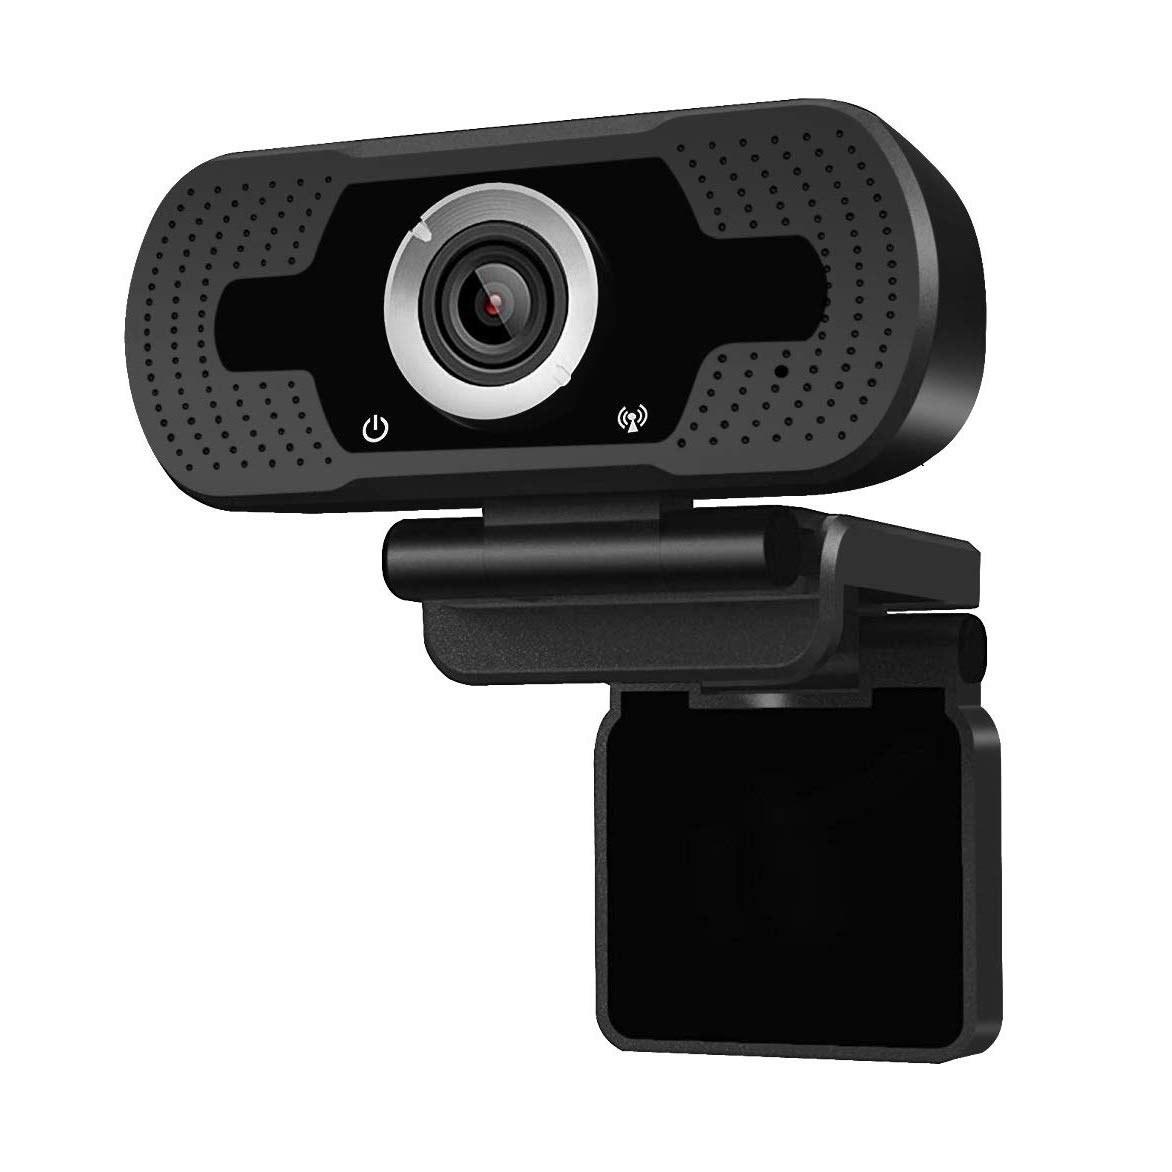 Anivia 1080p HD Webcam W8, USB Desktop Laptop Camera, Mini Plug and Play Video Calling Computer Camera, Built-in Mic, Flexible Rotatable Clip